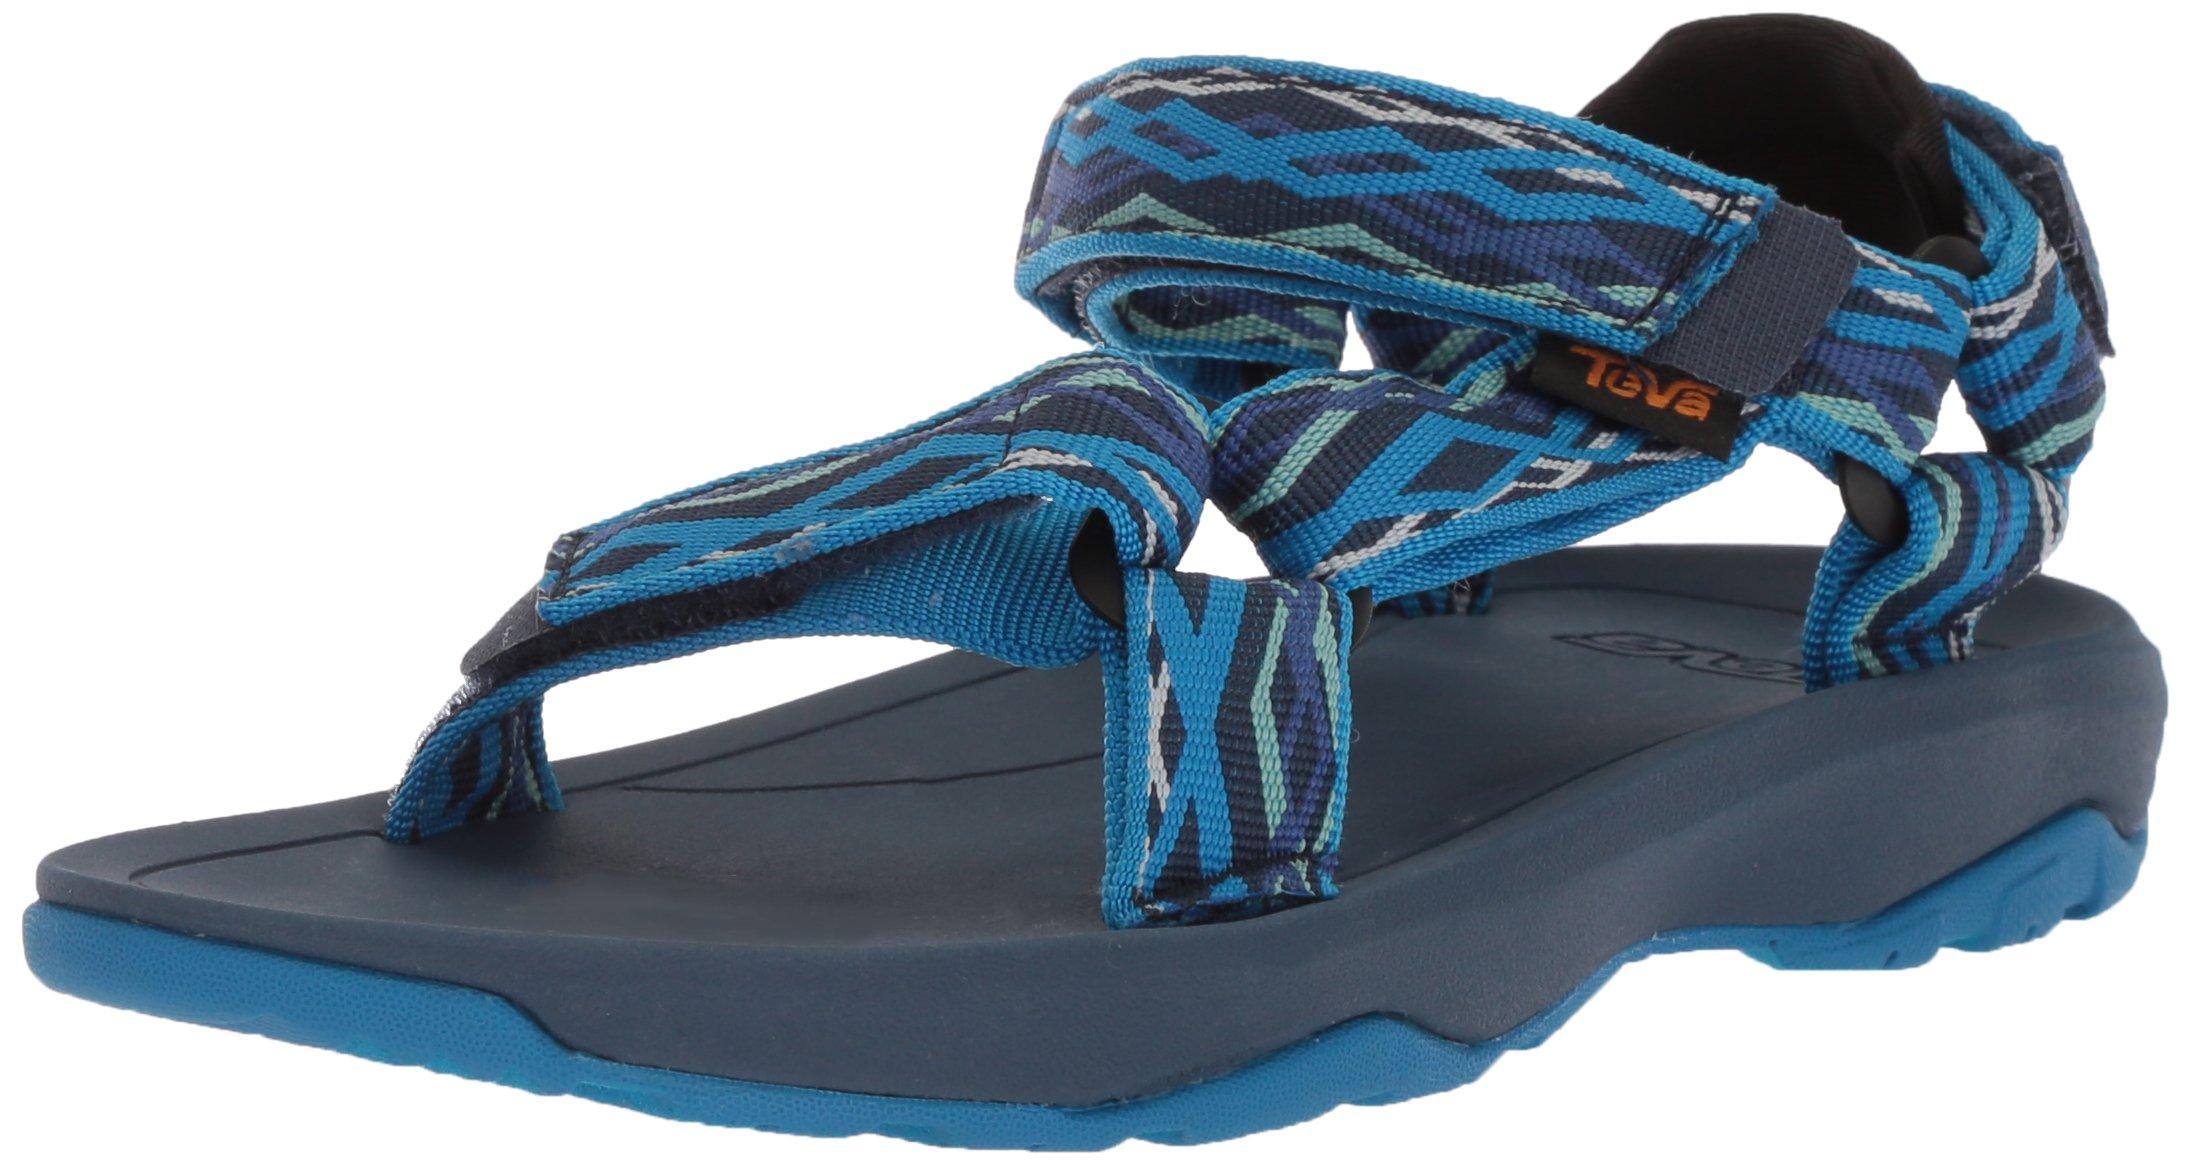 Teva Boys' Y Hurricane XLT 2 Sport Sandal Delmar Blue 7 M US Big Kid